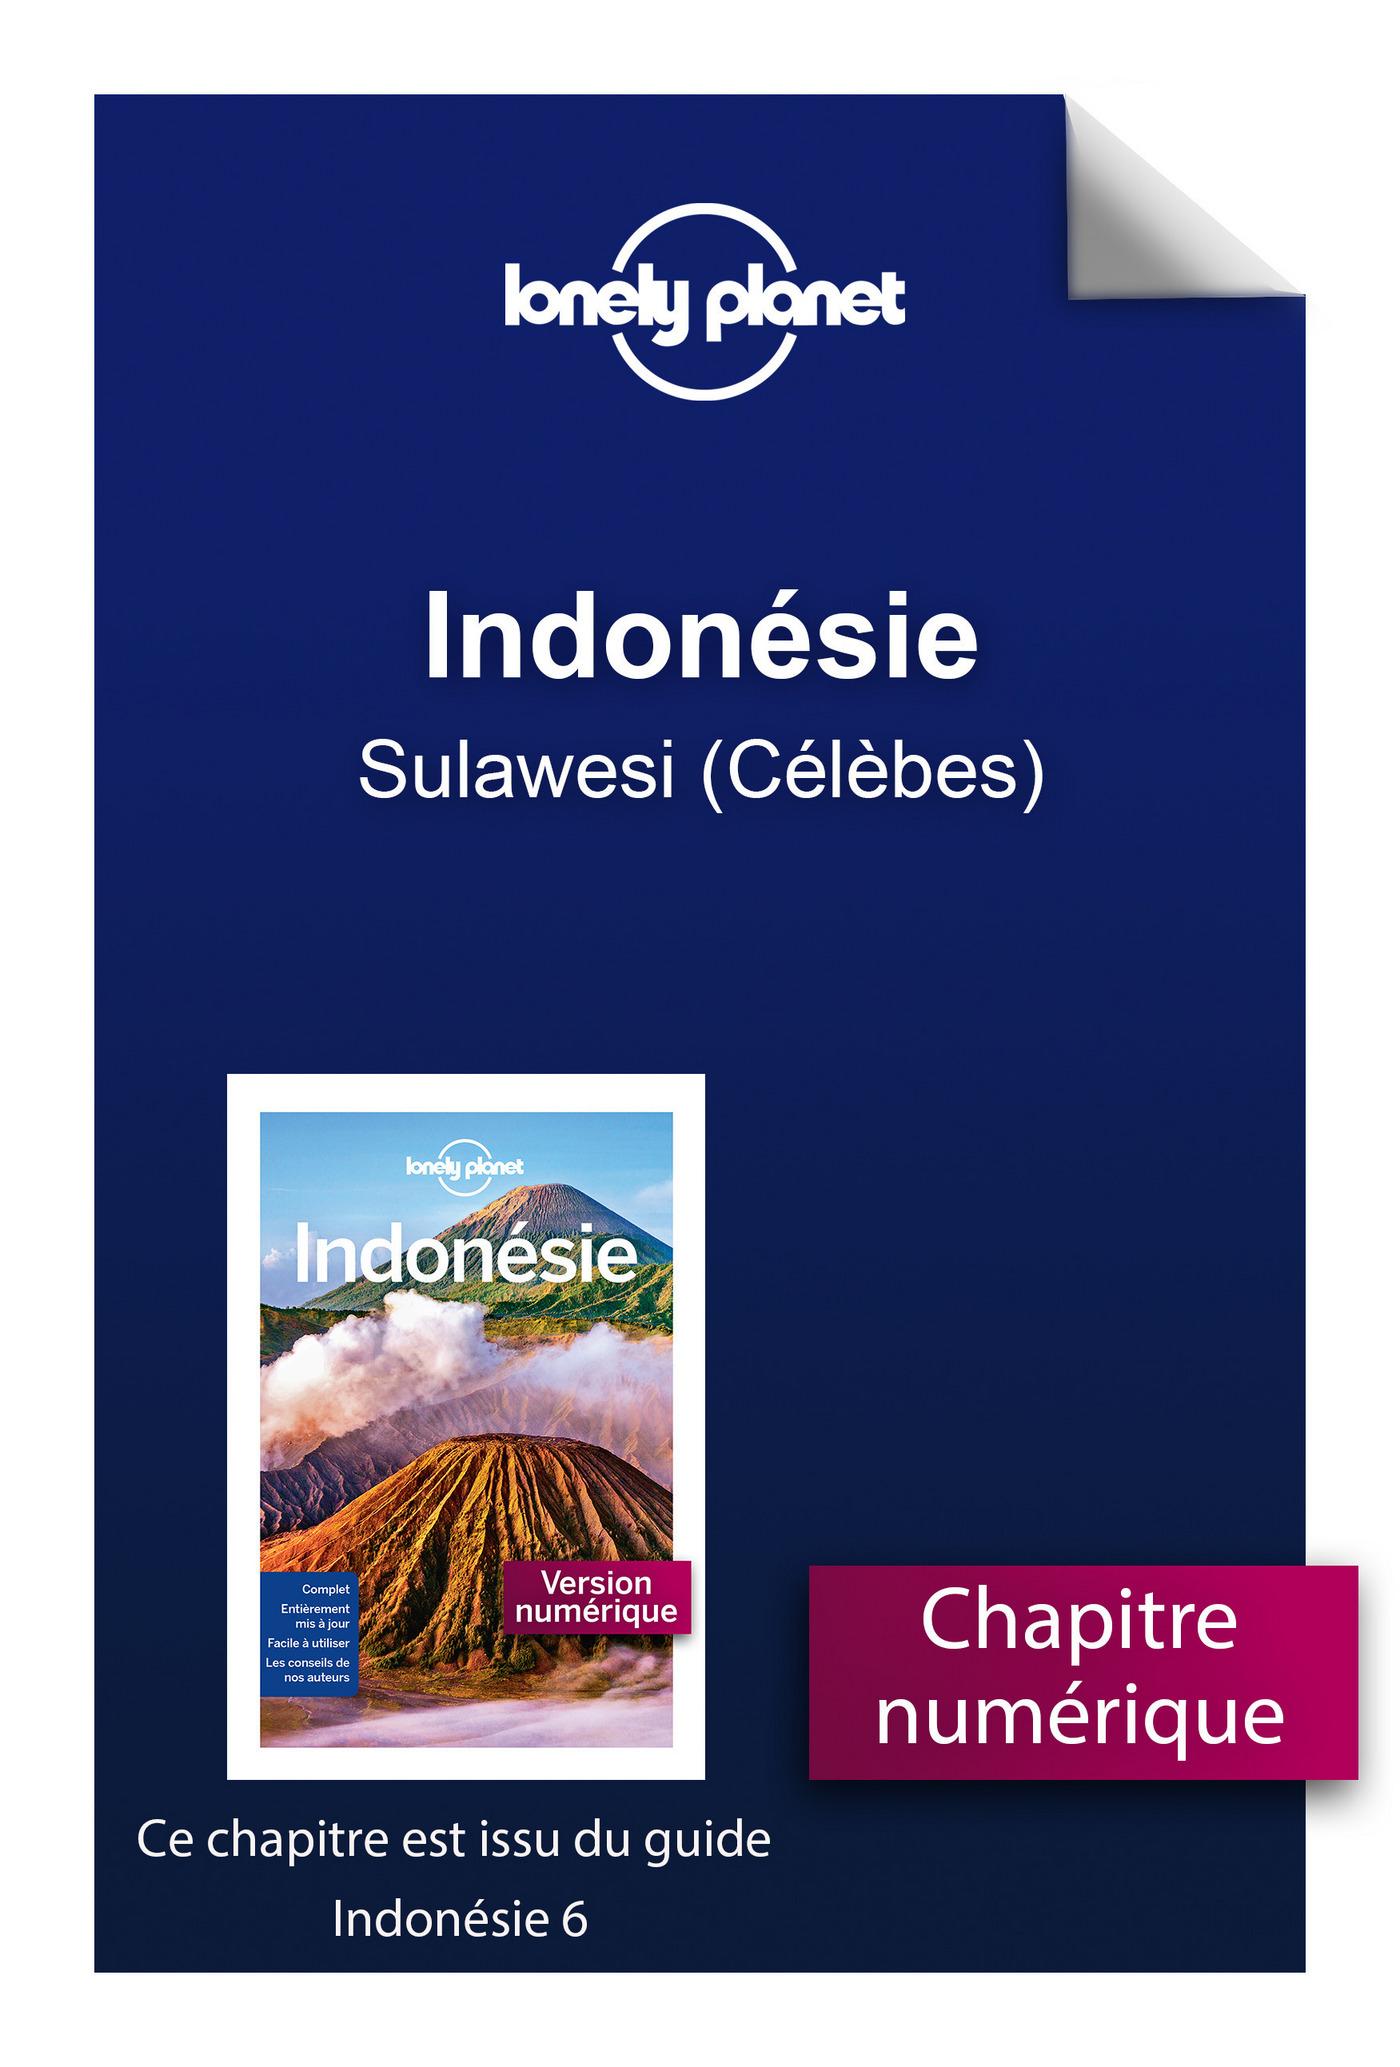 Indonésie - Sulawesi (Célèbes)